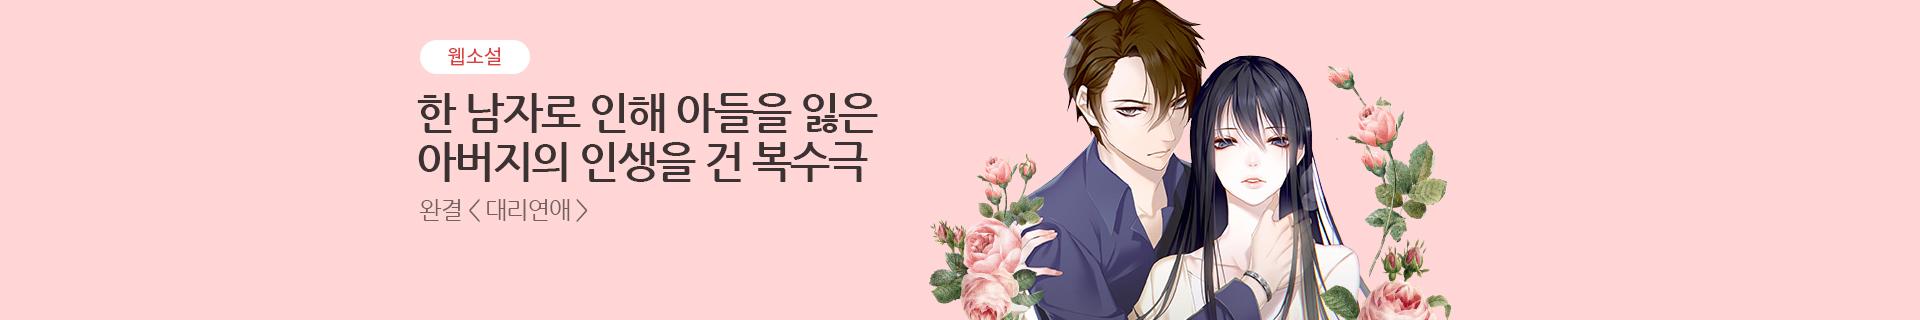 PC_sub_bn_웹소설_대리연애_1920_320.jpg